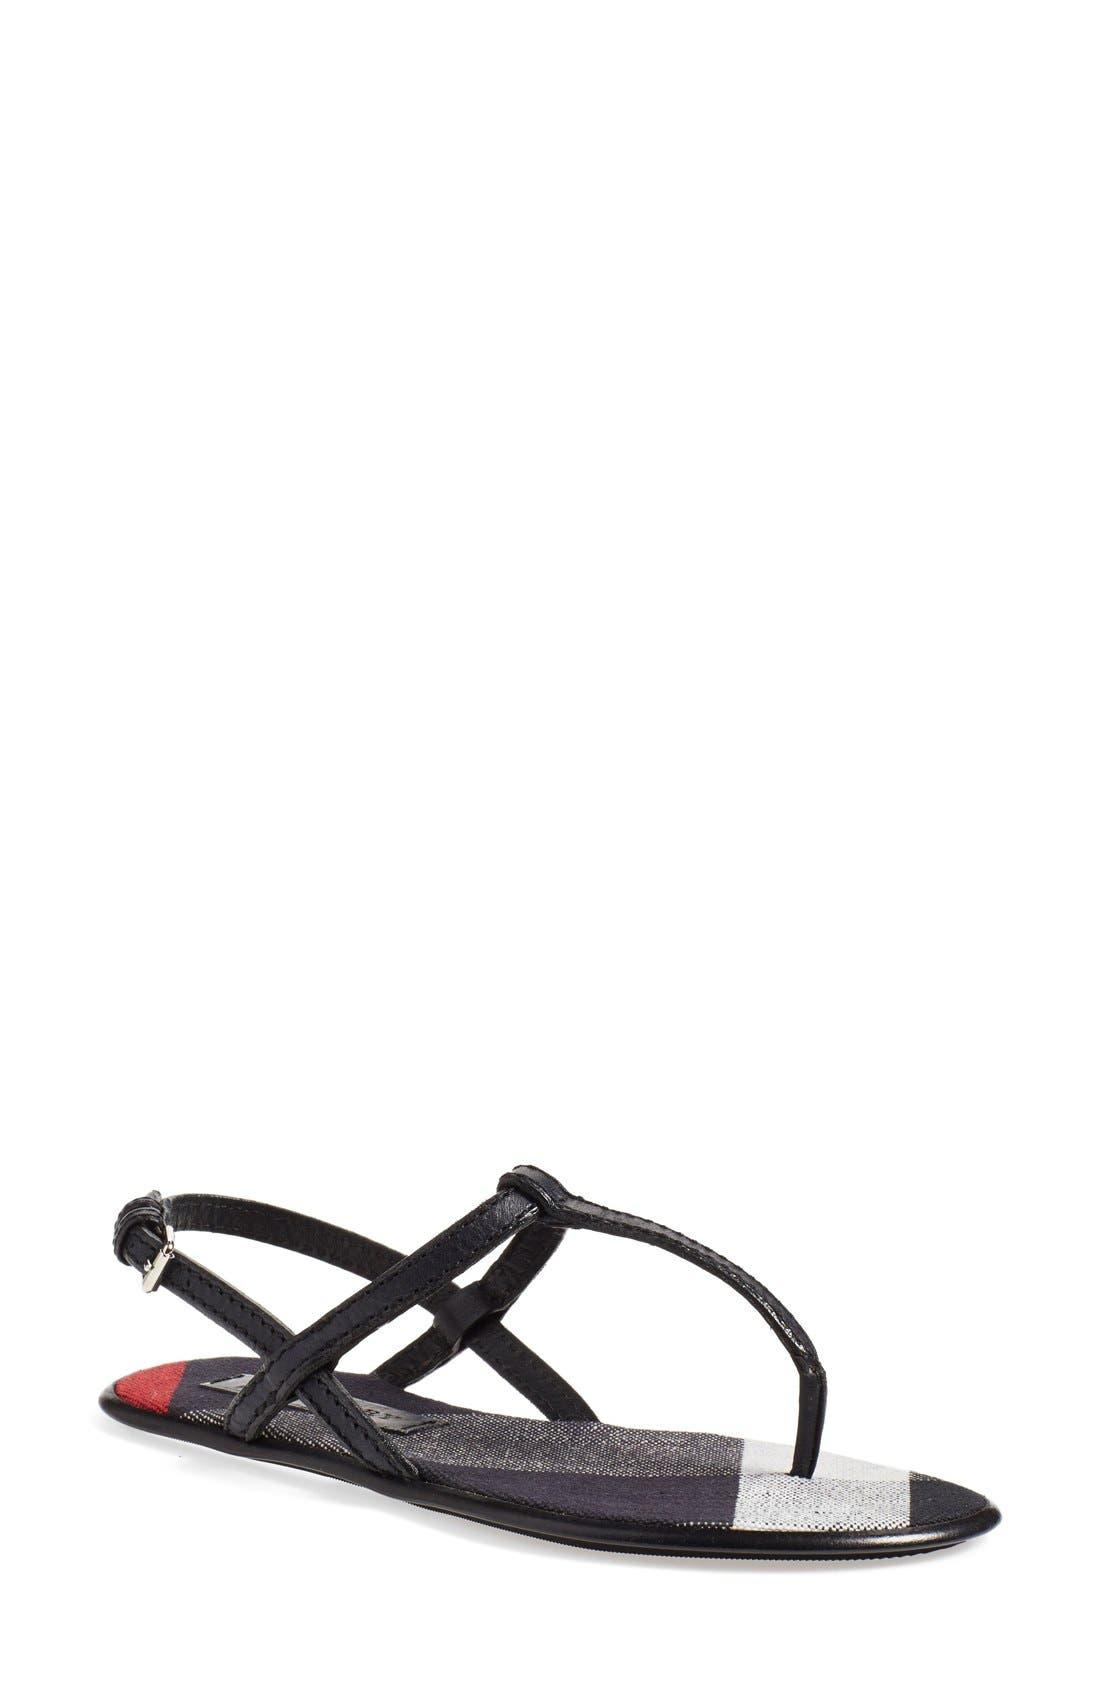 Main Image - Burberry 'Ingeldew' T-Strap Sandal (Women)